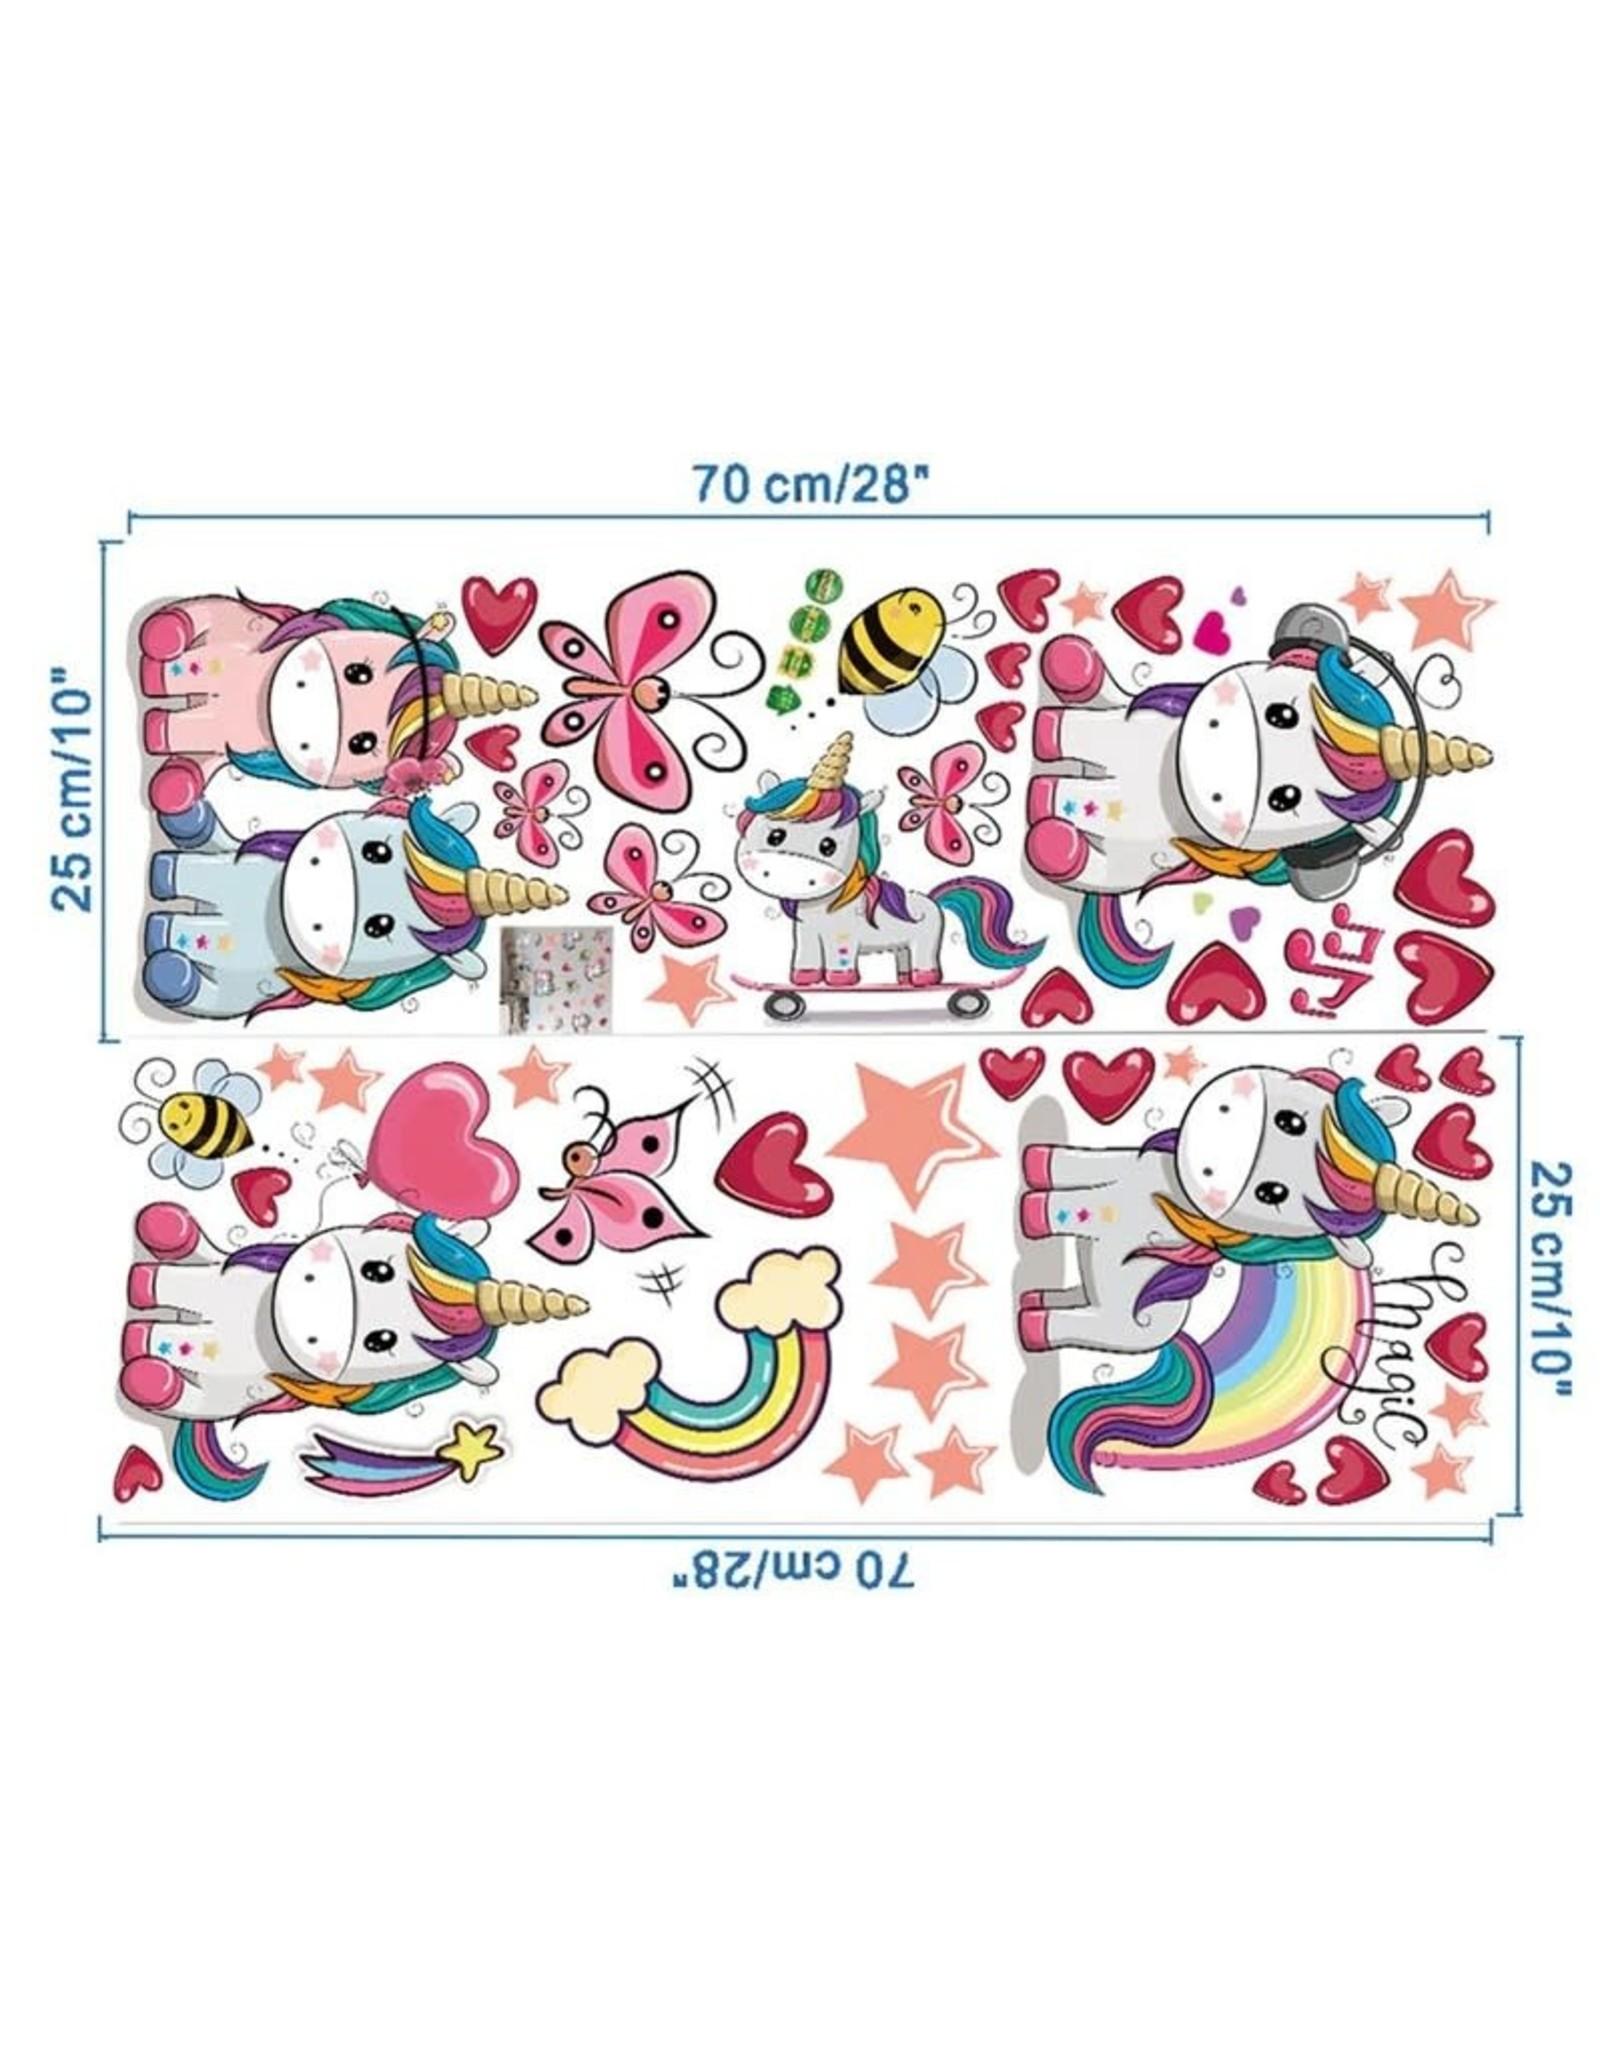 La Licornerie Vinyl Wall Stickers - 2 sheets